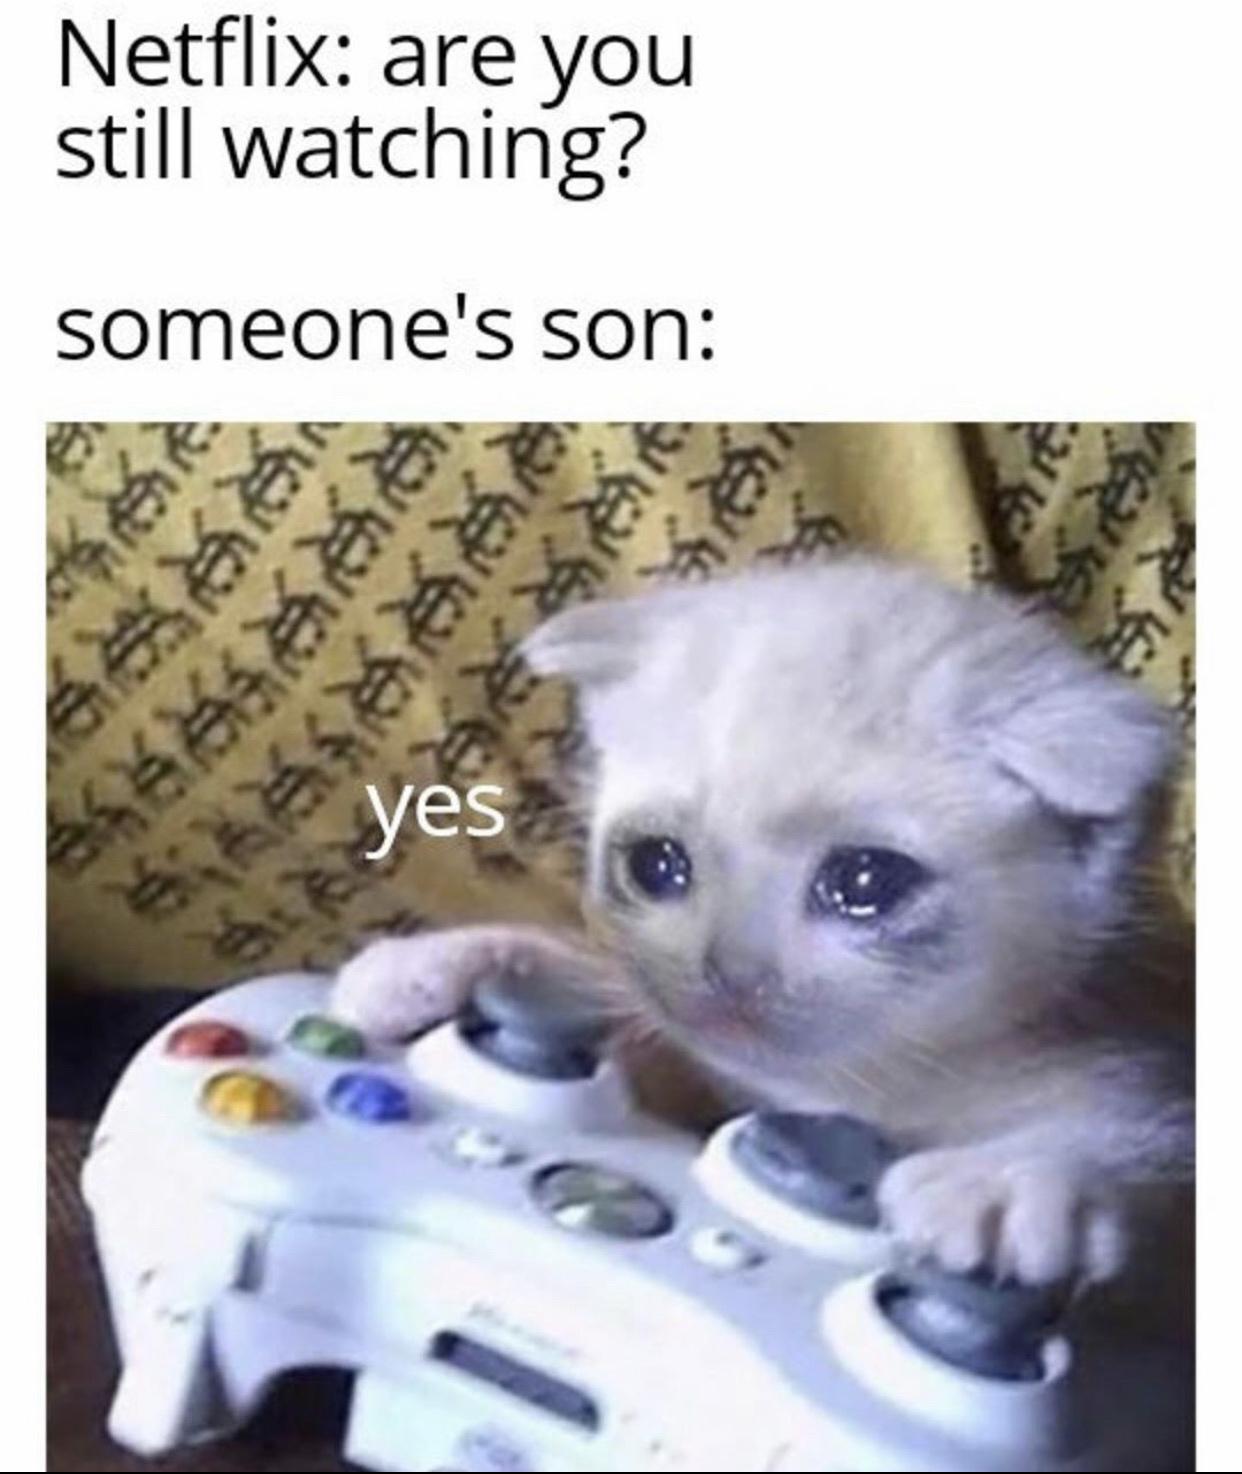 rip sad cat - meme